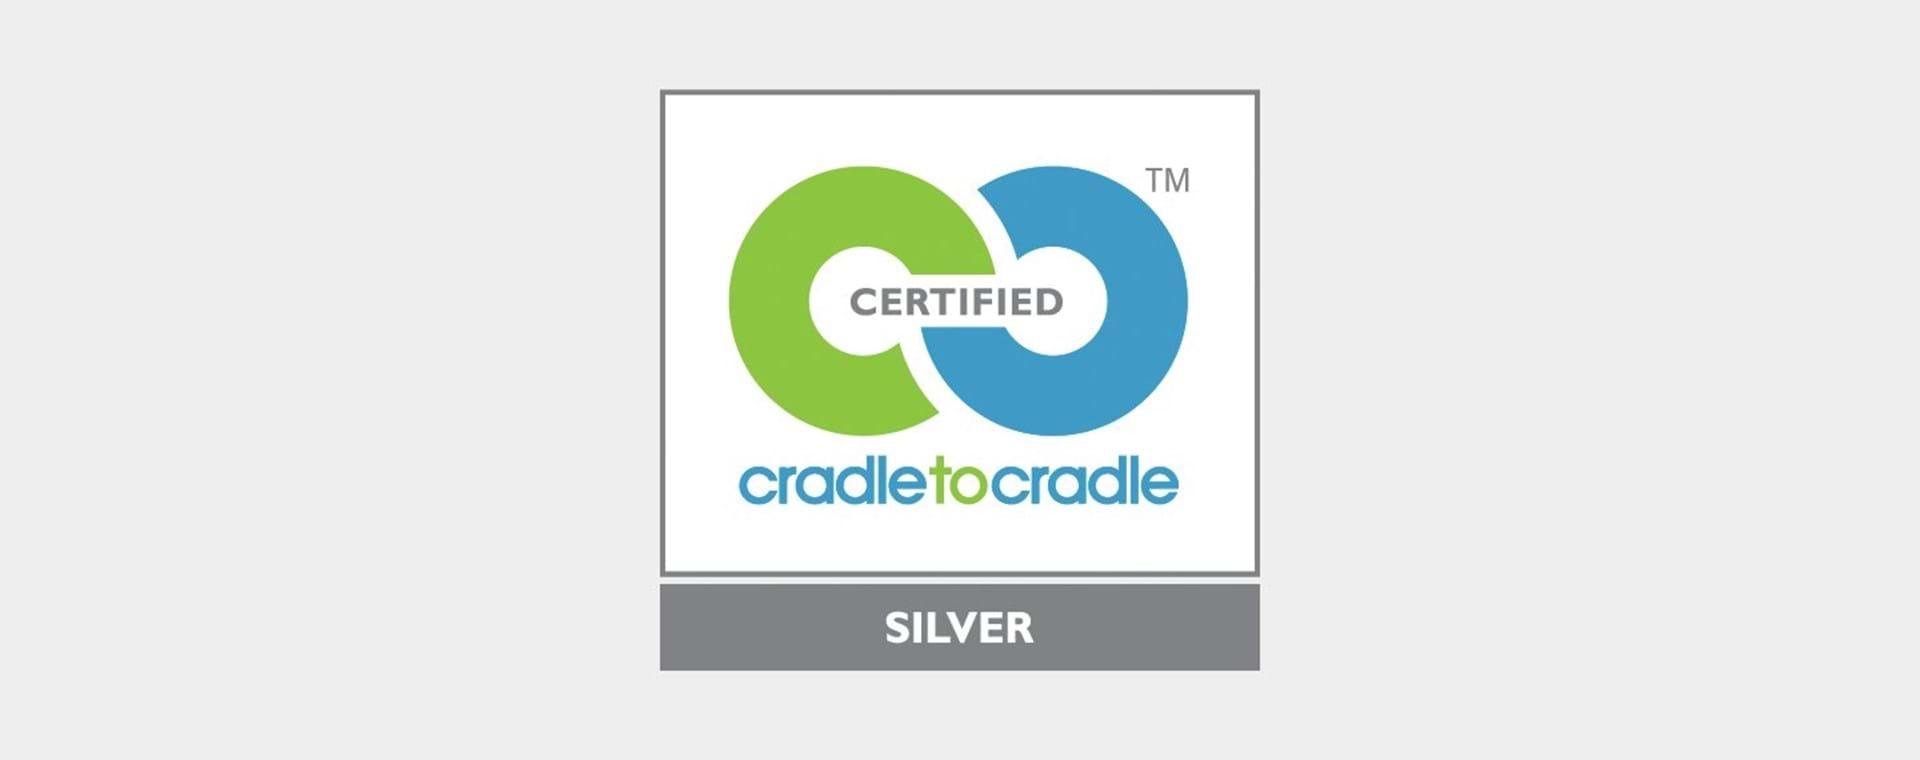 C2C silver certified